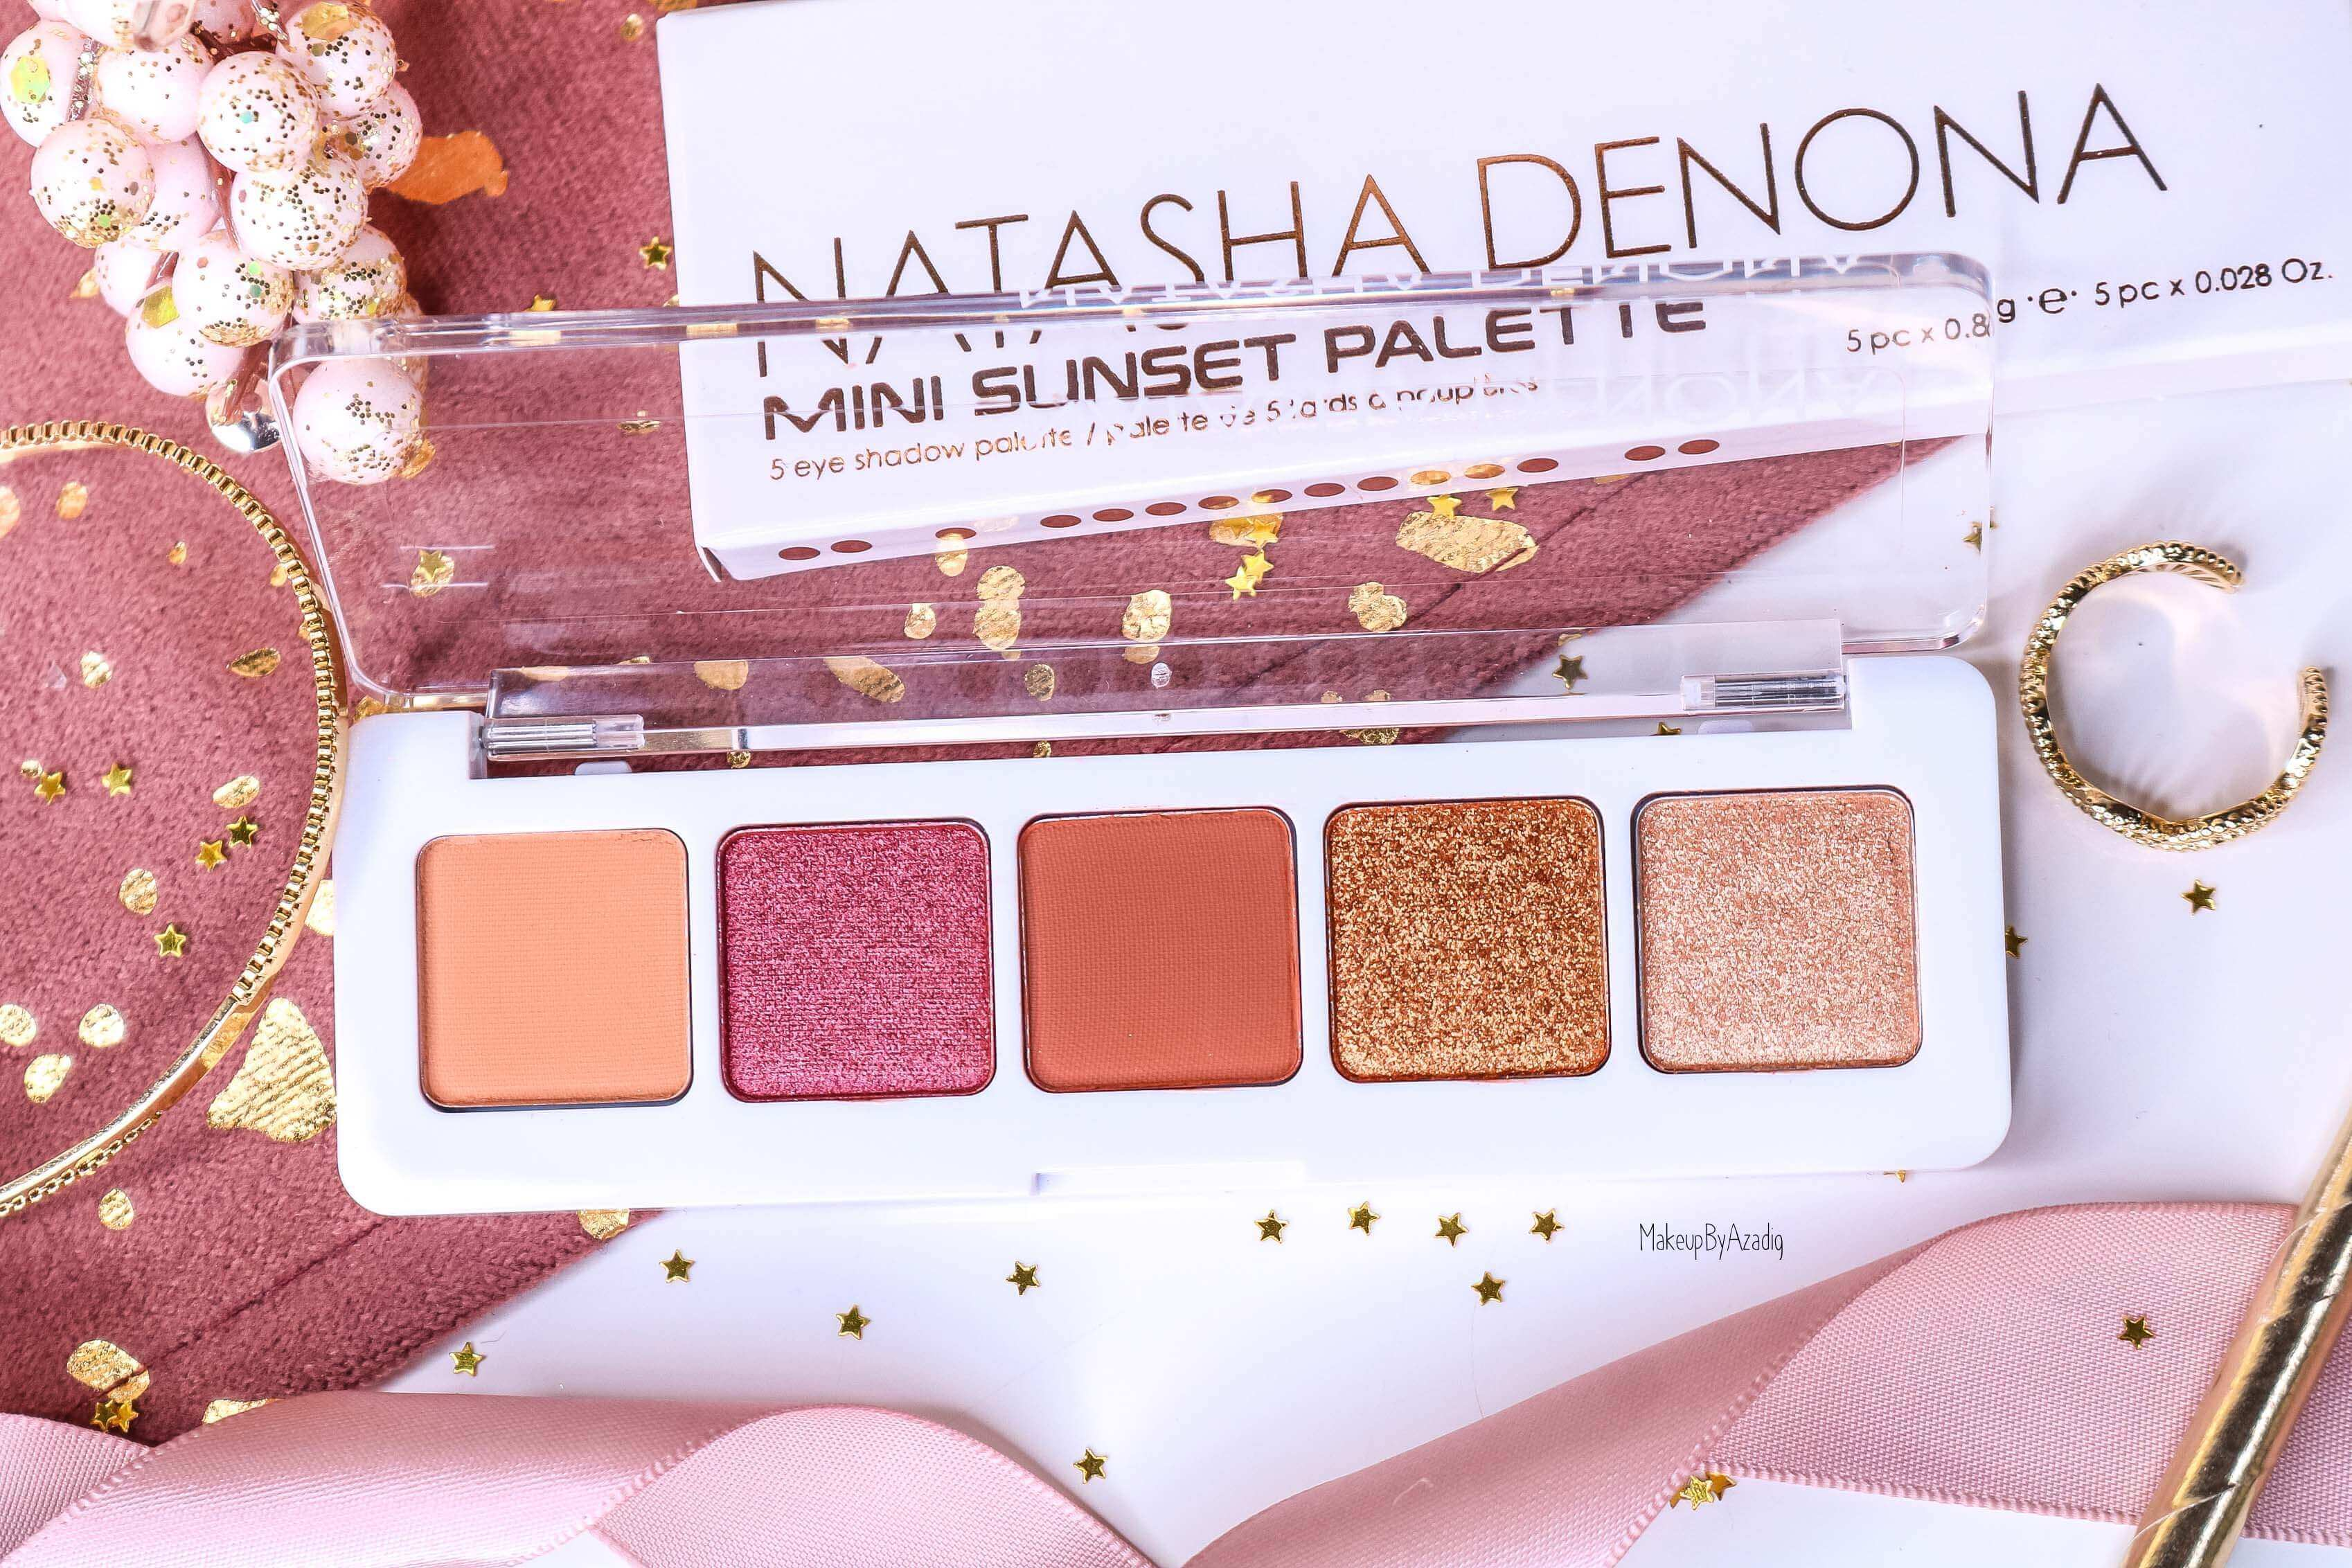 revue-palette-mini-sunset-natasha-denona-sephora-france-avis-prix-swatch-gold-champagne-burgundy-makeupbyazadig-eyeshadow-teintes